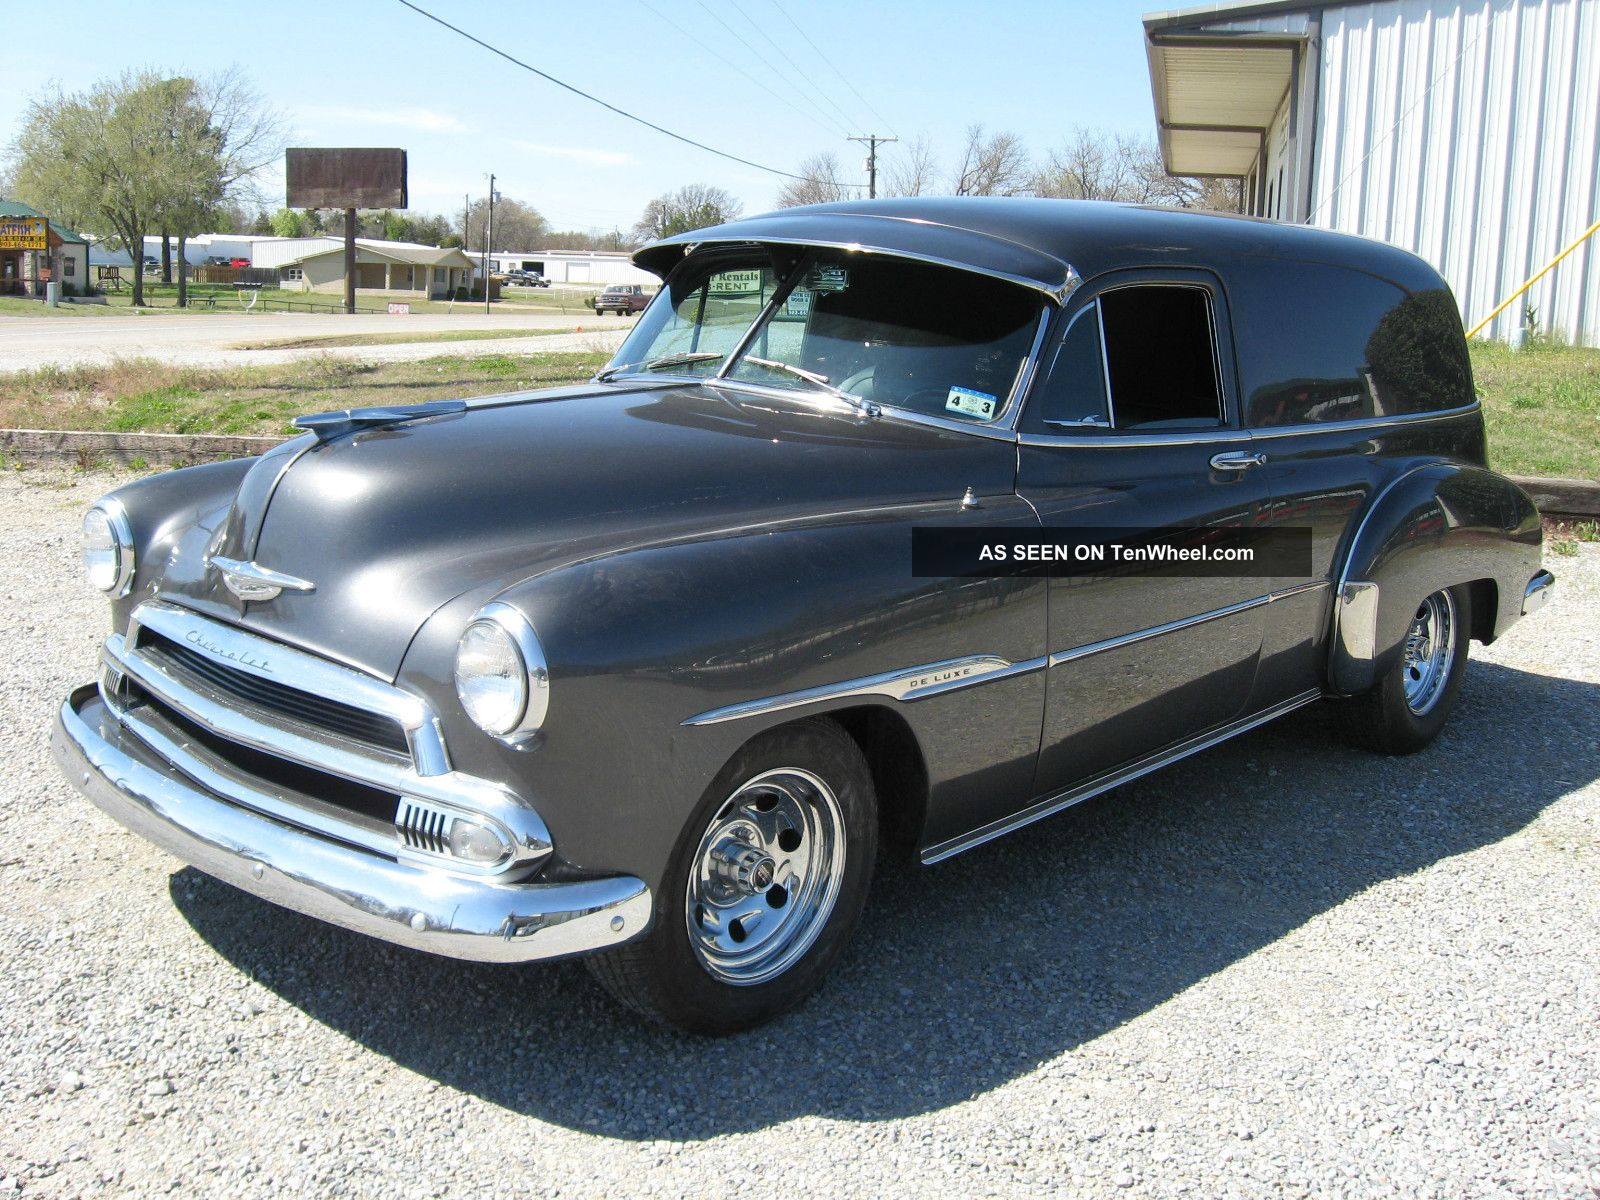 1950 Chevy Panel Truck Craigslist   Upcomingcarshq.com